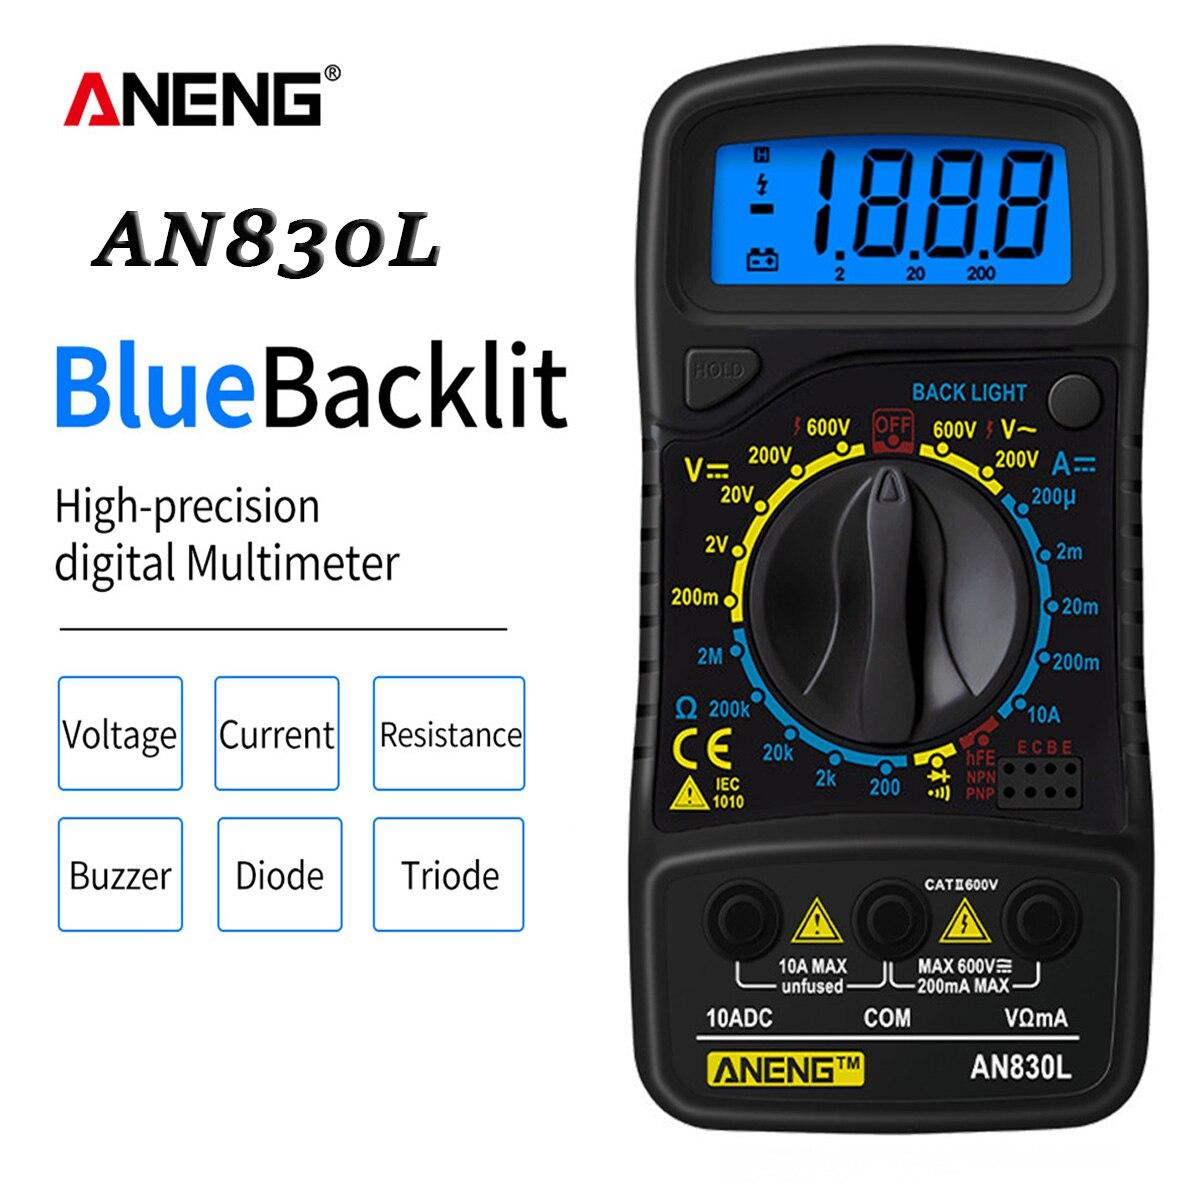 ANENG XL830L Digital Multimeter Esr/Lcr Meter Testers Automotive Electrical Dmm Transistor Pocket Tester Meter Capacitance Meter